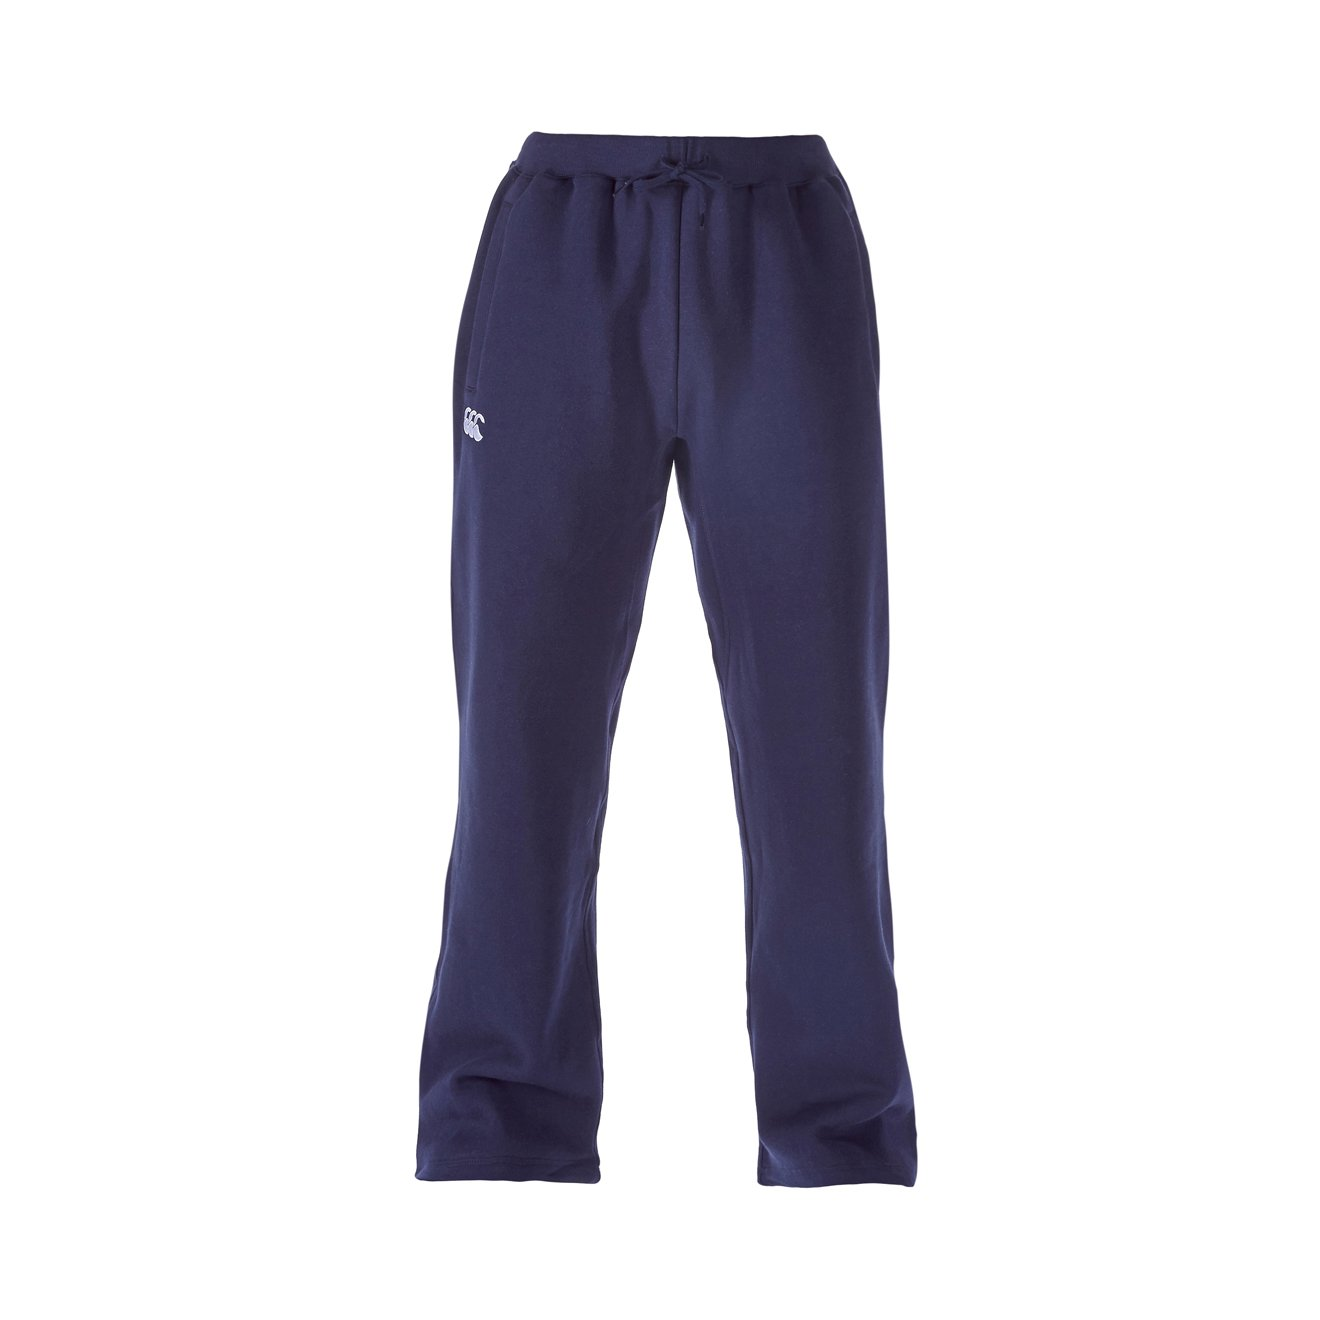 Canterbury Men's Combination Sweat Pants